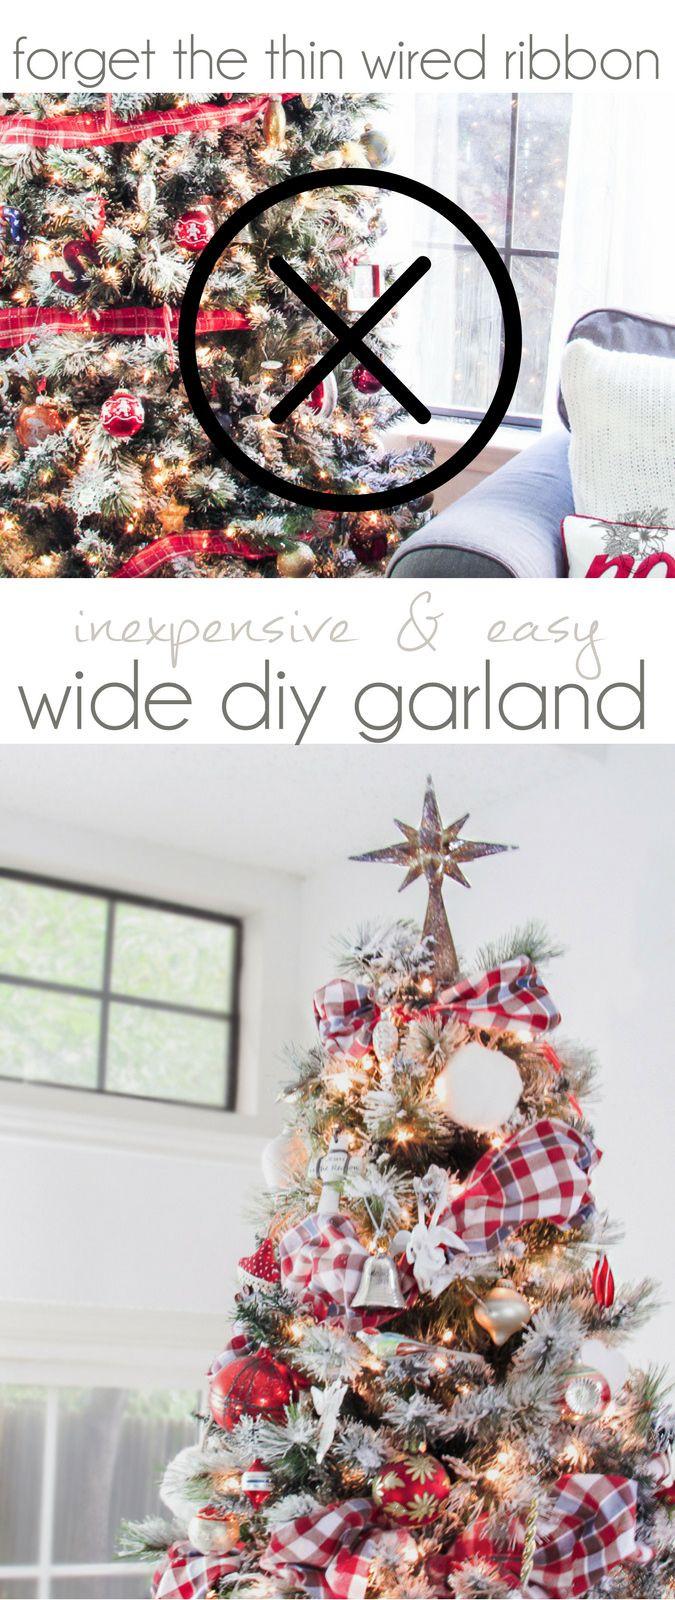 DIY Christmas Garland Ideas  Best 25 Christmas tree garland ideas on Pinterest